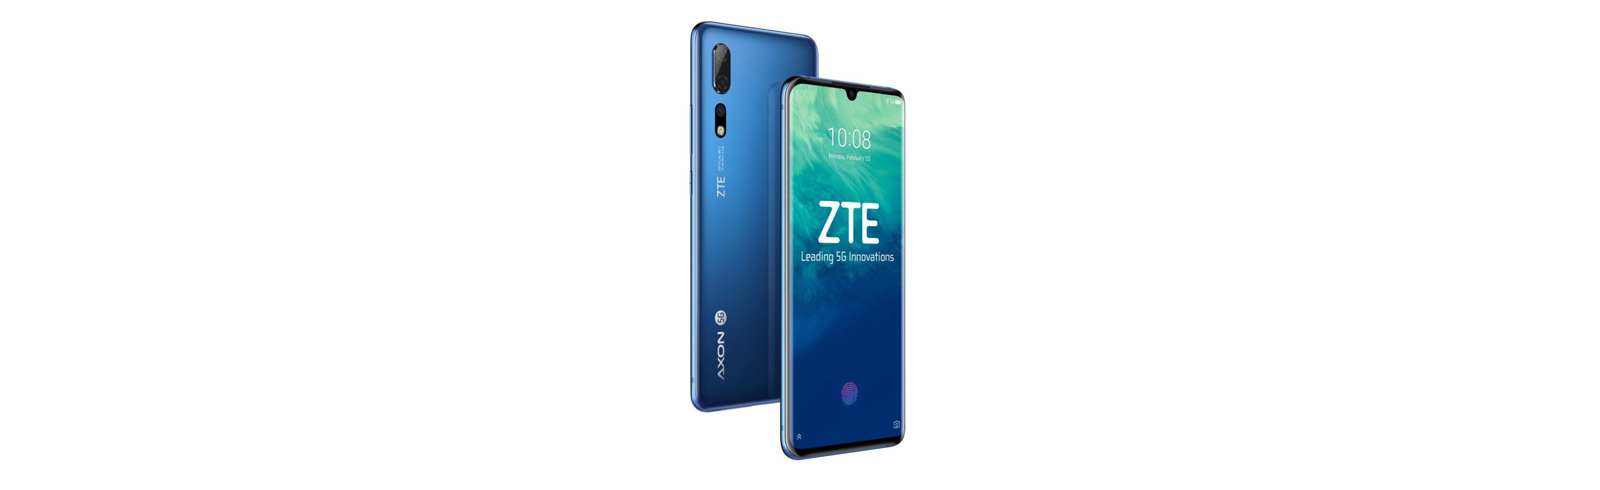 ZTE Axon 10 Pro 5G and ZTE Blade V10 are announced